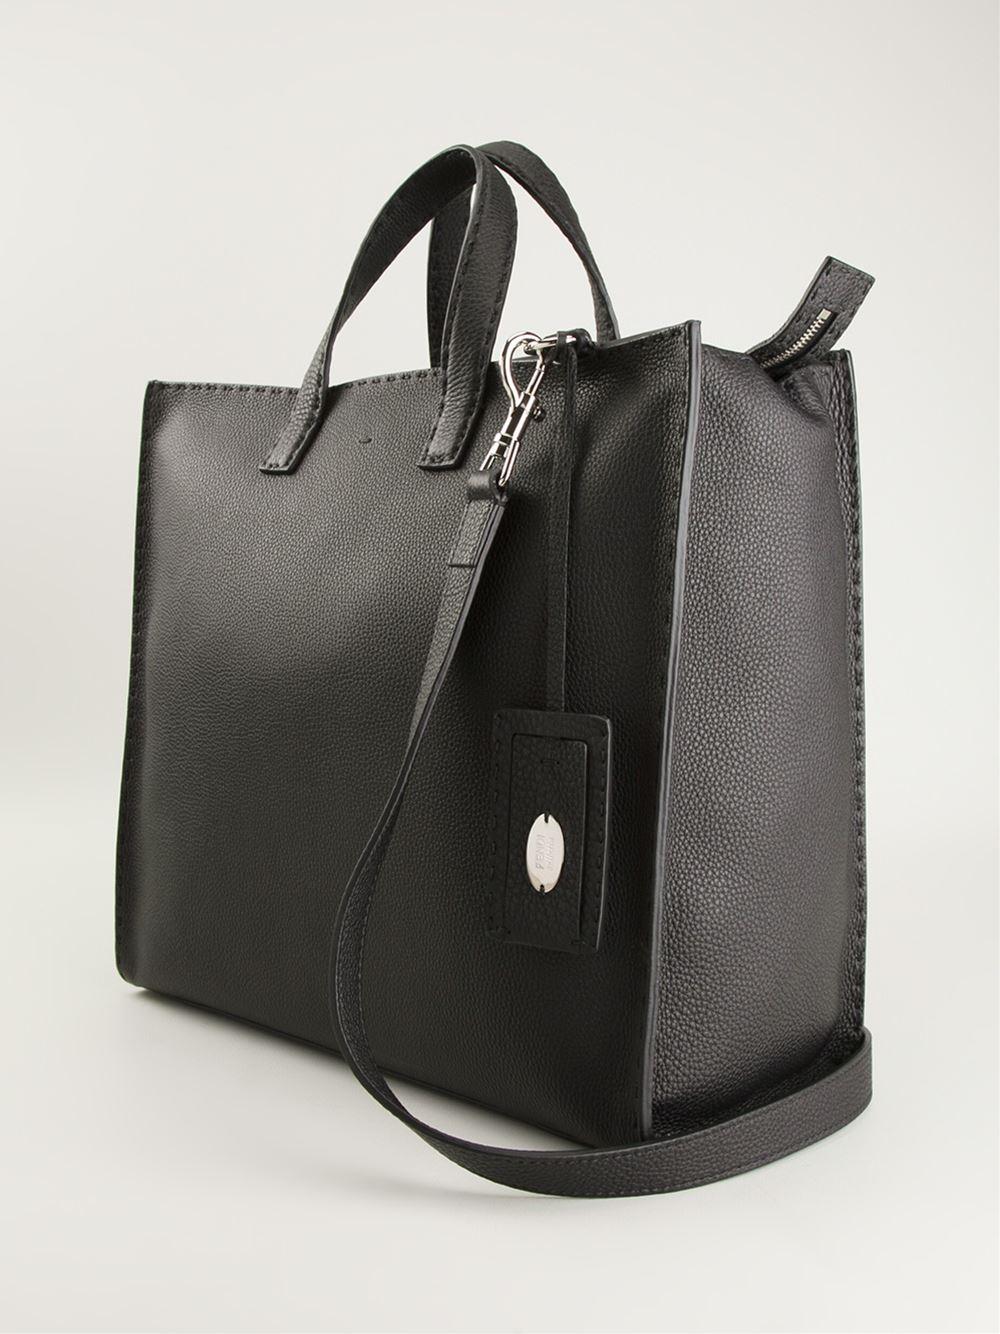 d341dbe5040f Lyst - Fendi Selleria Tote in Black for Men